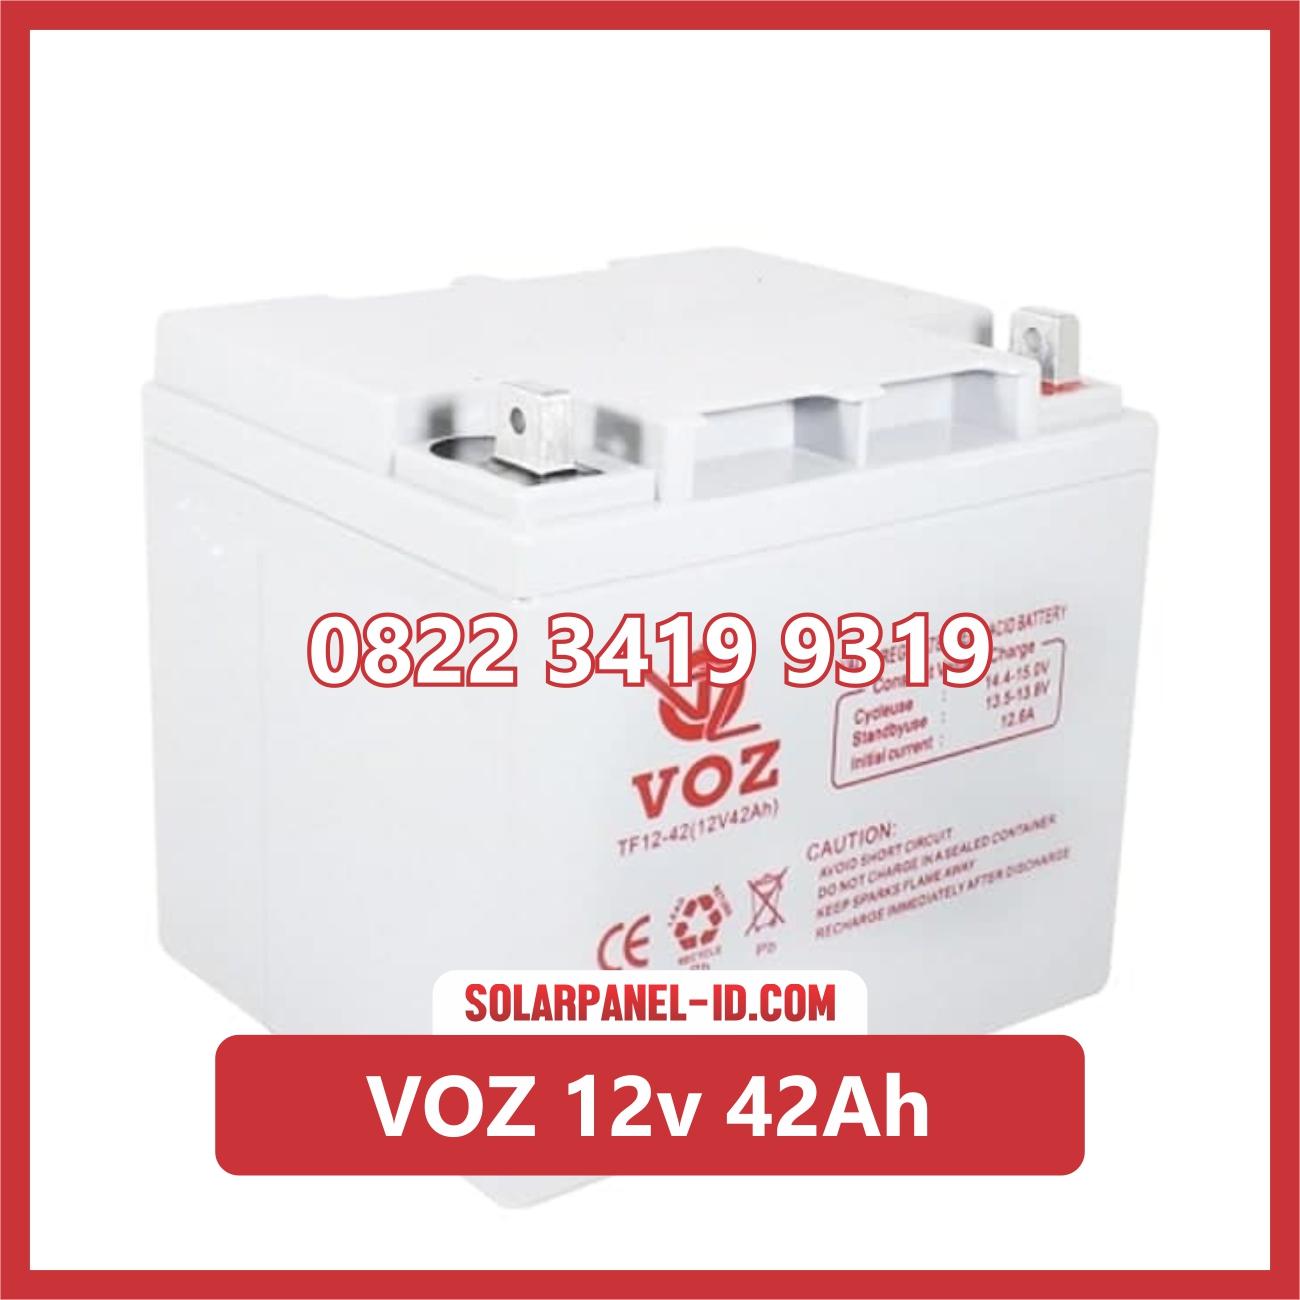 VOZ baterai kering 12v 42Ah baterai panel surya